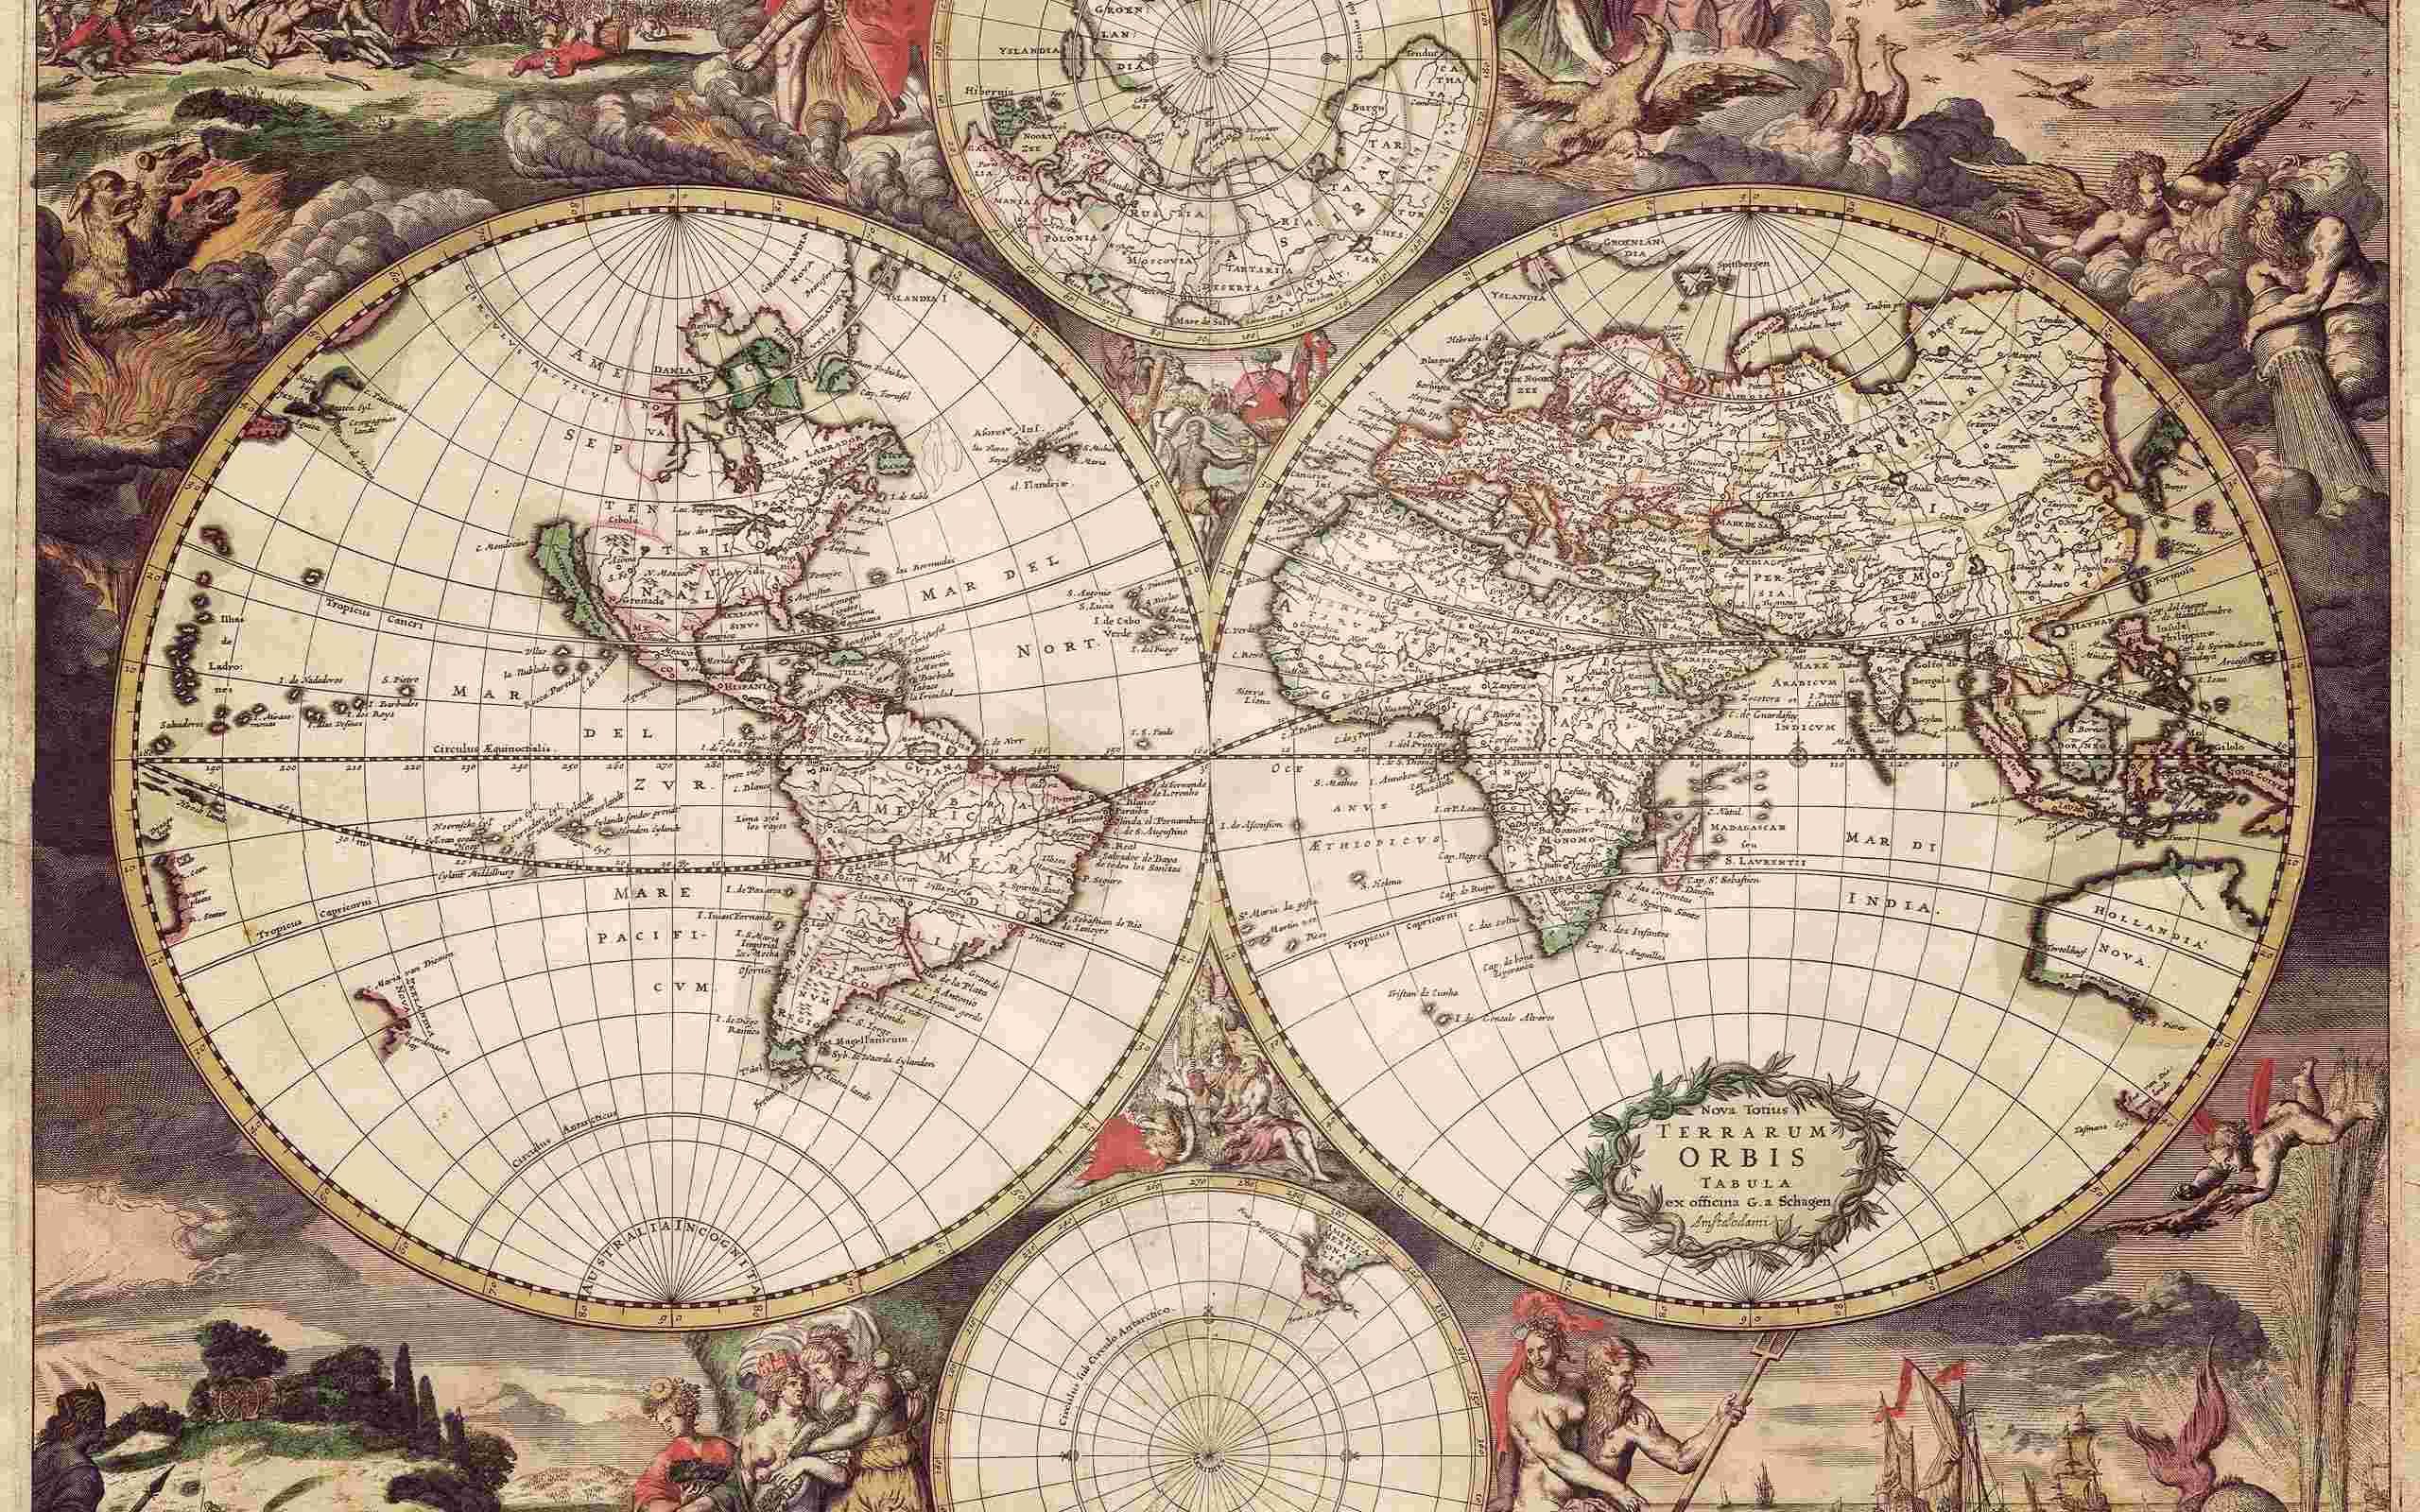 World map computer wallpaper wallpapersafari old world map 1689 wallpaper unsorted other wallpaper gumiabroncs Choice Image